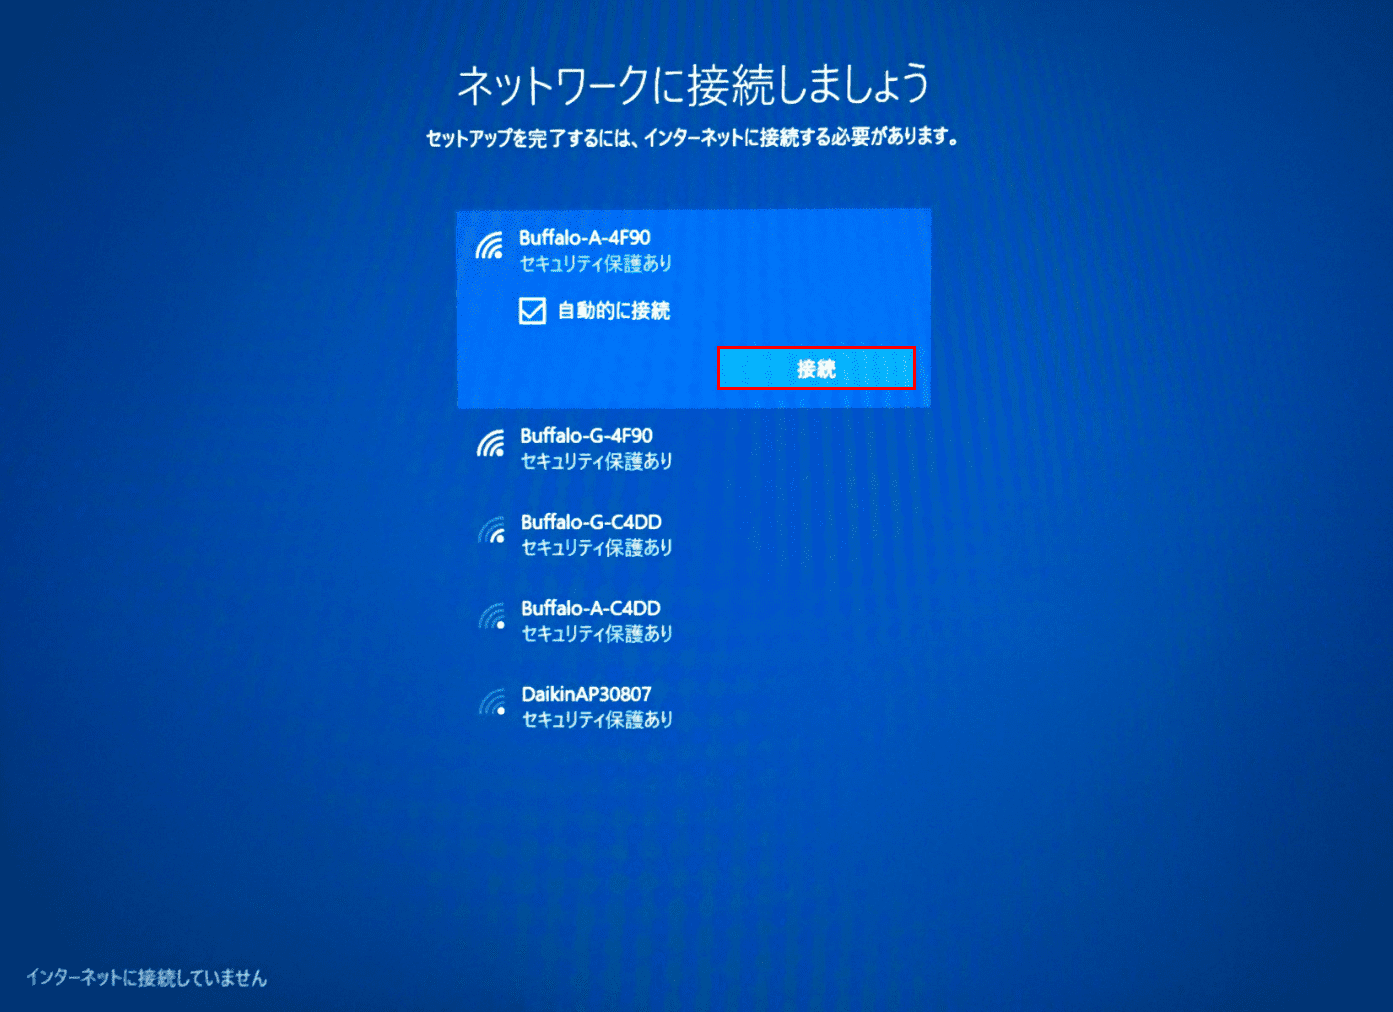 Windows10Microsoftアカウントでの初期設定、ネットワーク接続設定